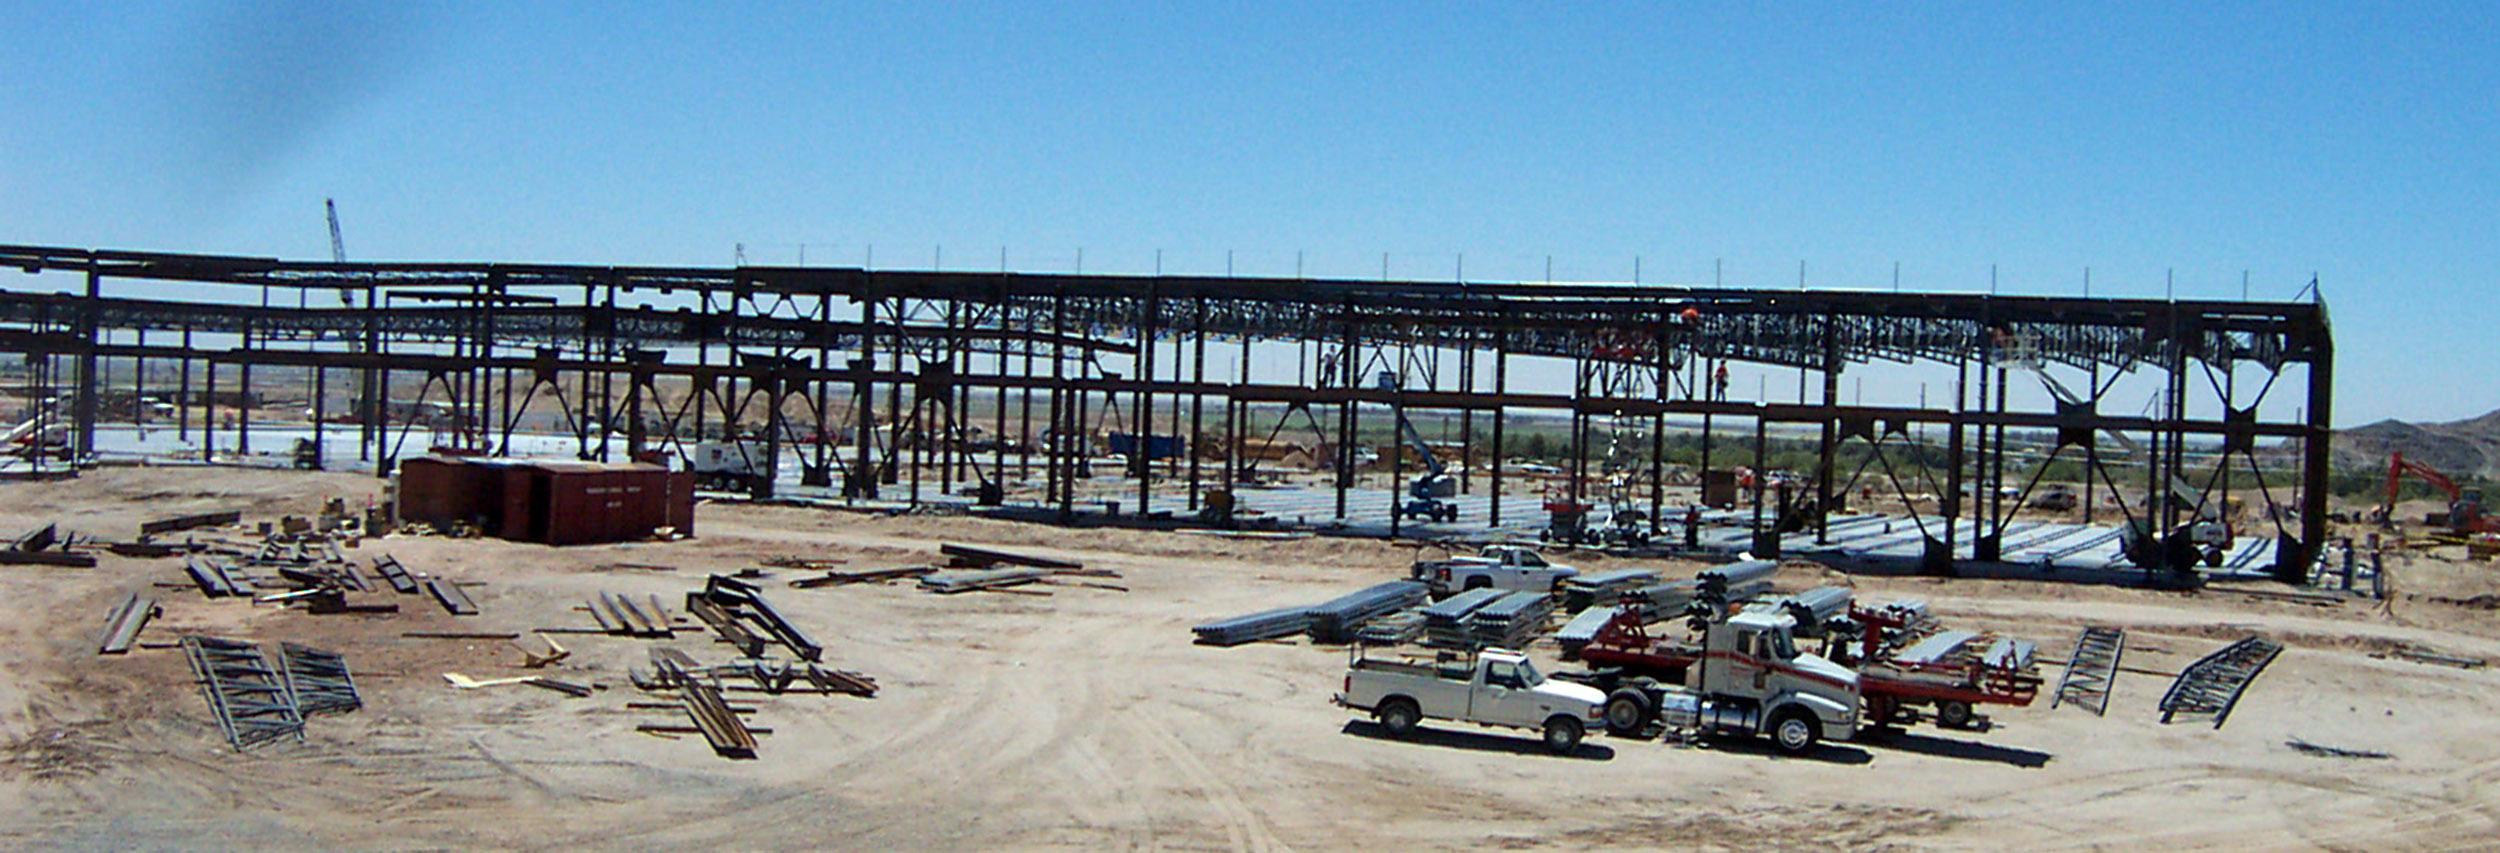 Quechan Casino Structural Steel